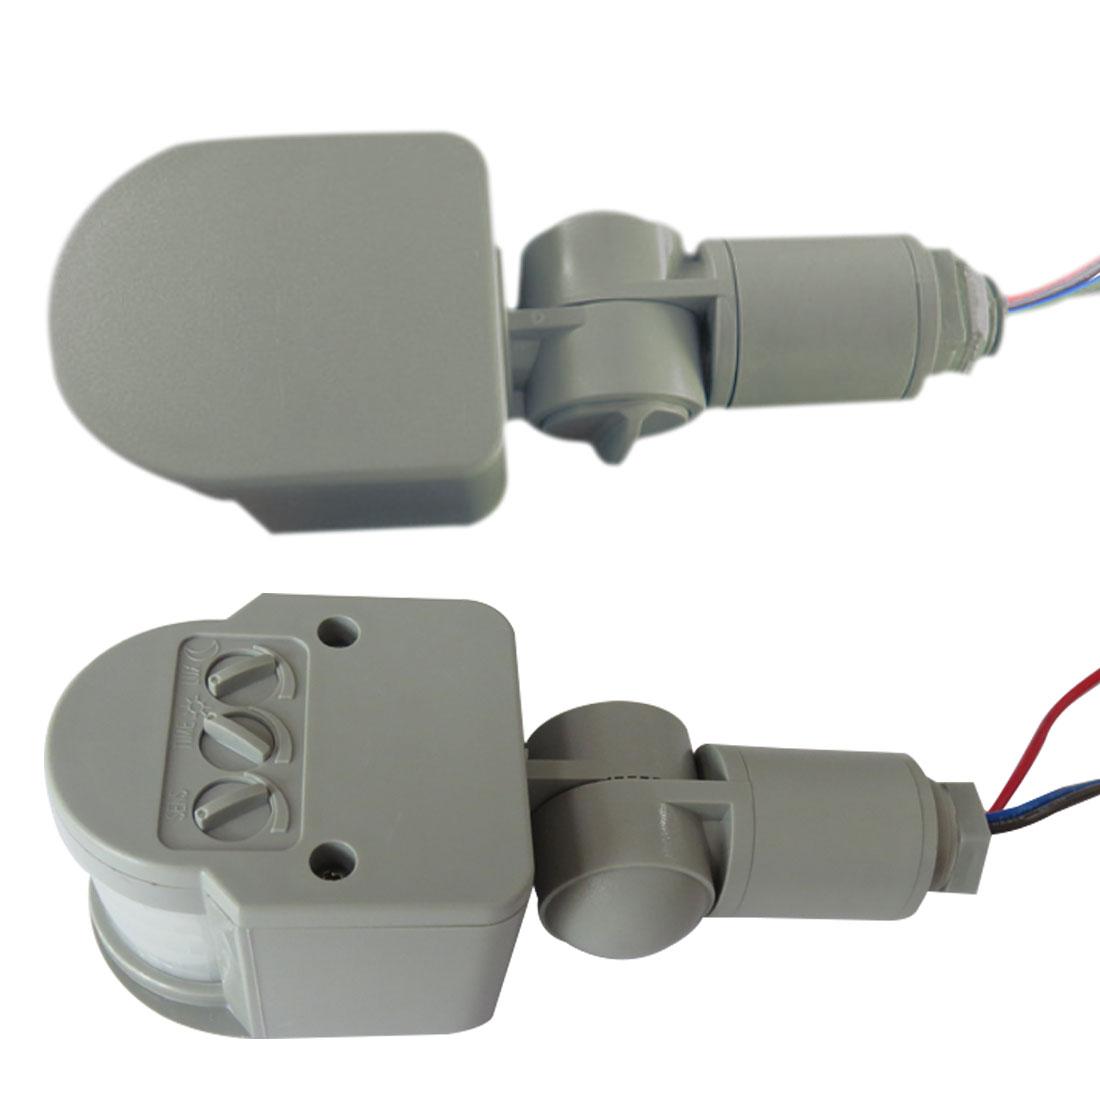 1pcs Motion Sensor Light Switch Outdoor AC 220V Automatic Infrared PIR Motion  Sensor Switch For LED